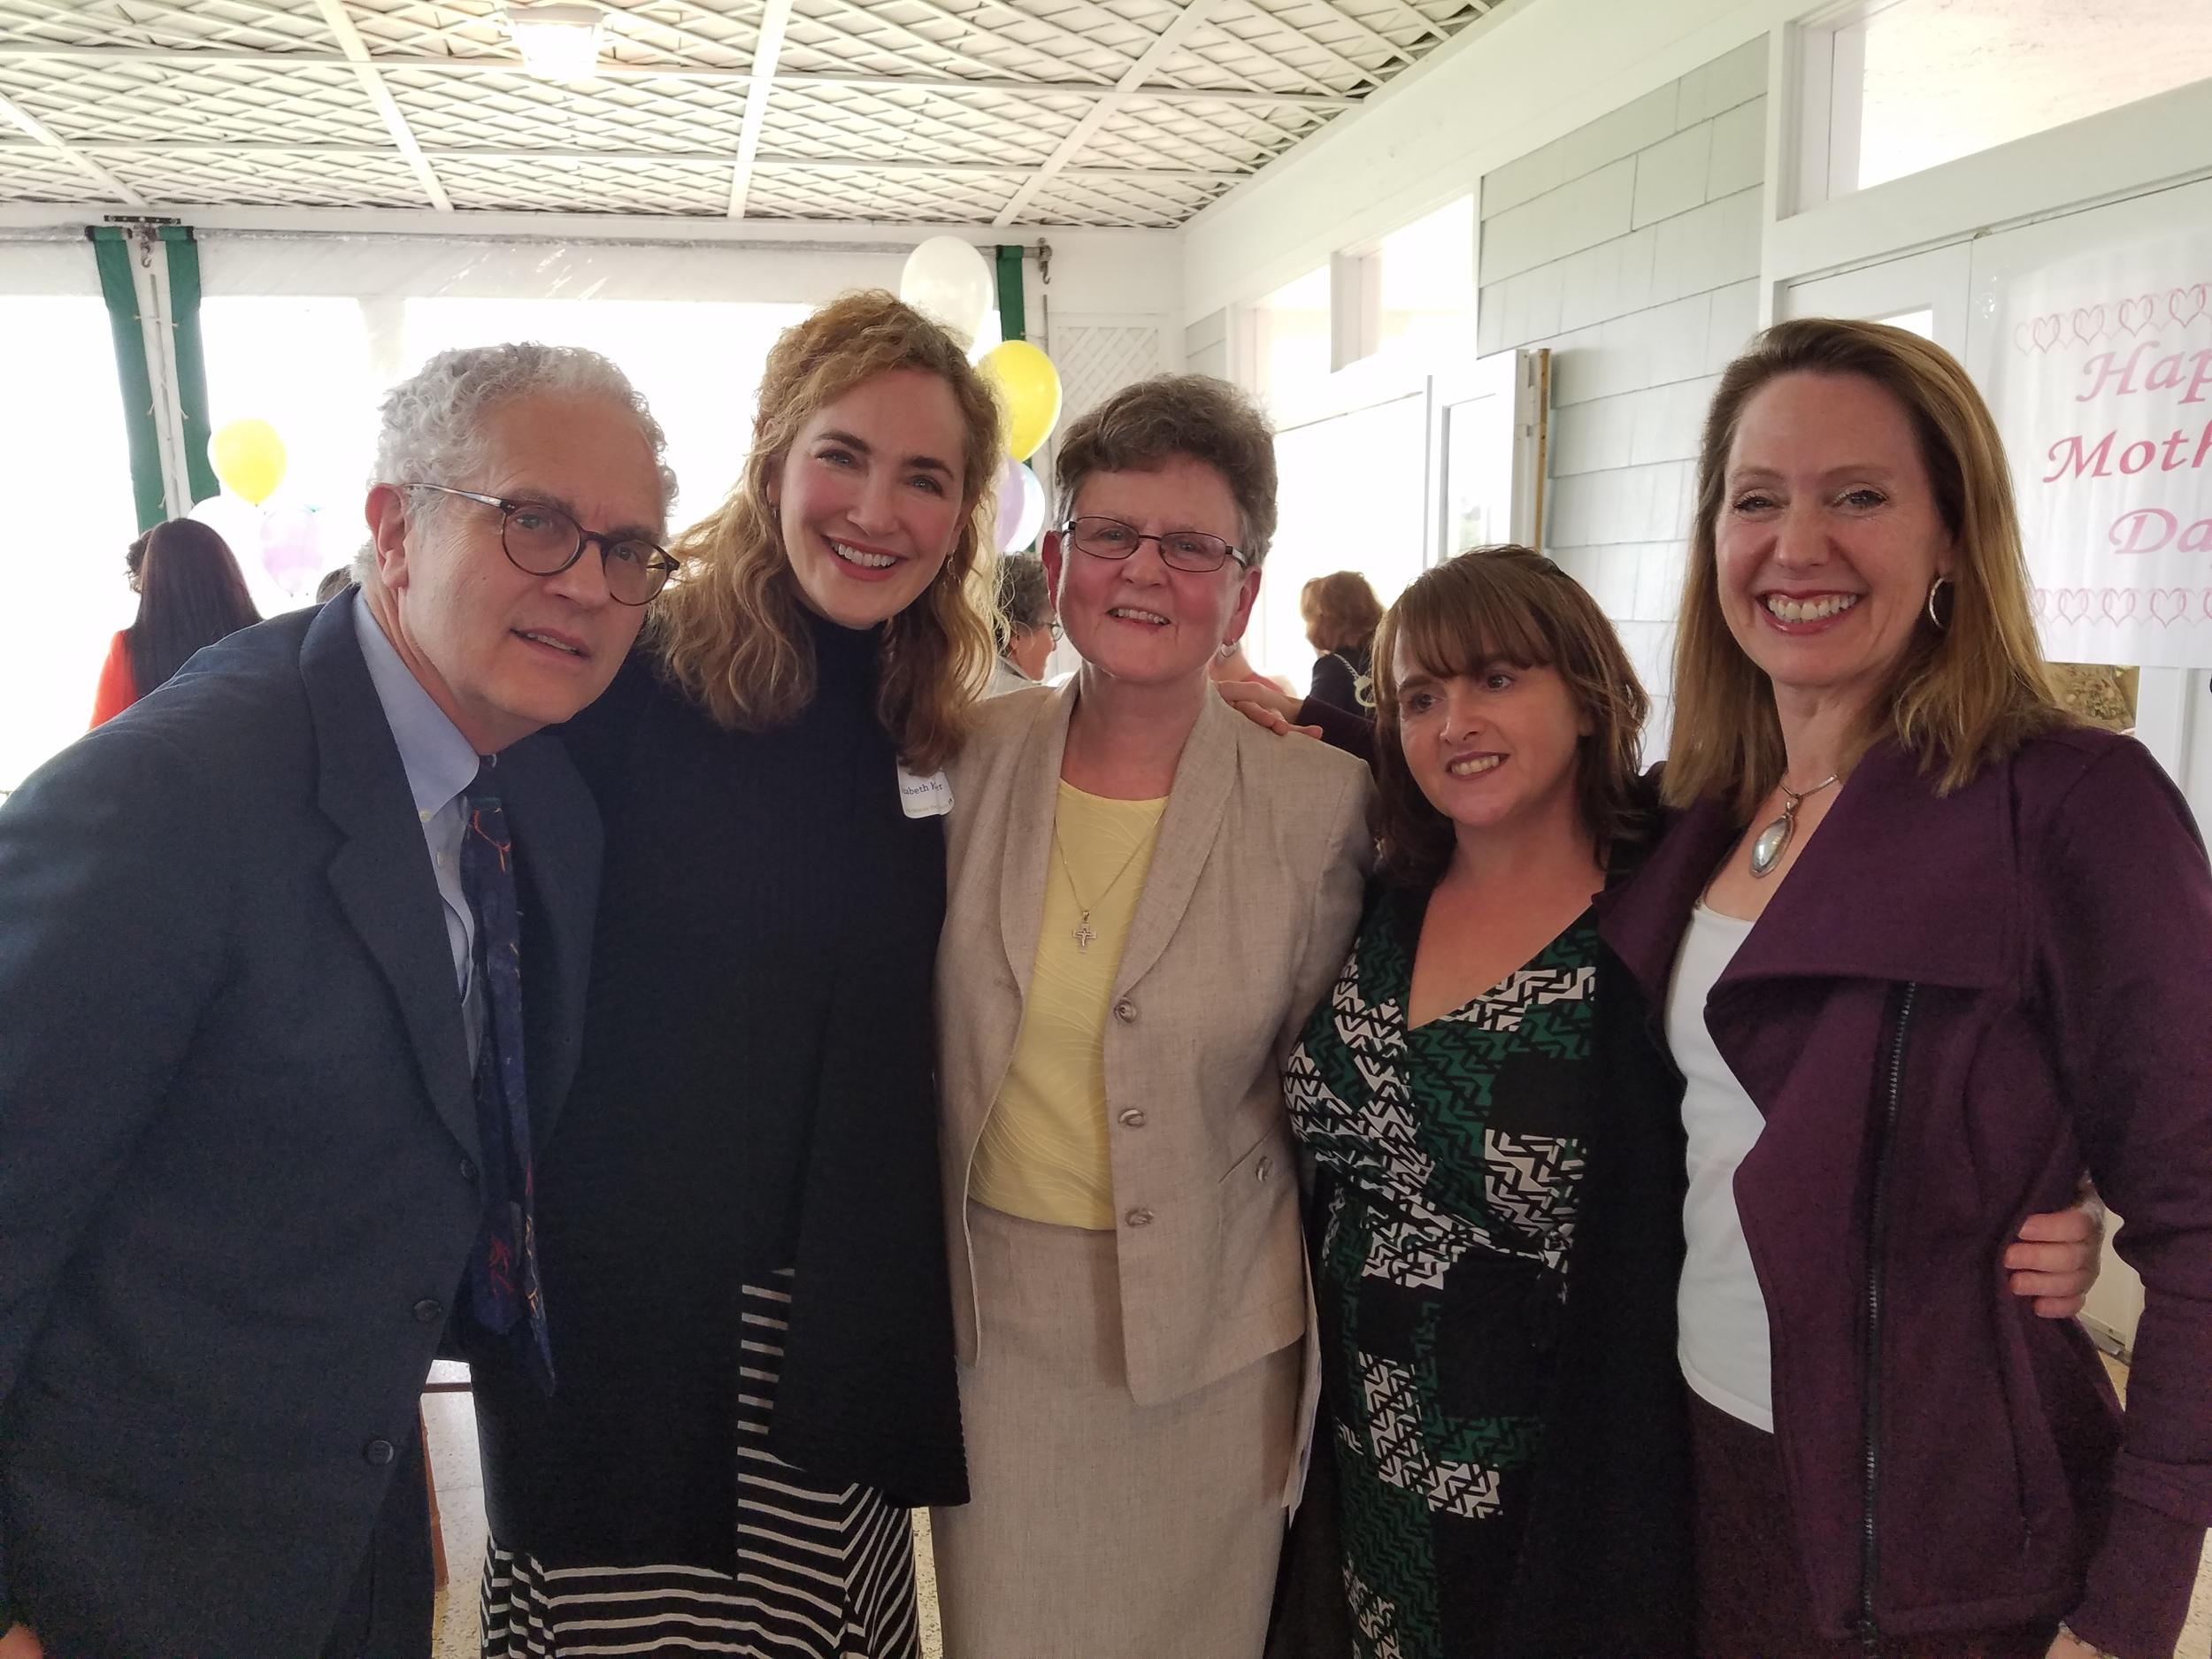 Michael Minard, Elizabeth Kemler, Sister Tesa, Kellie Phelan, and Beth Blatt at the Hour Children luncheon.